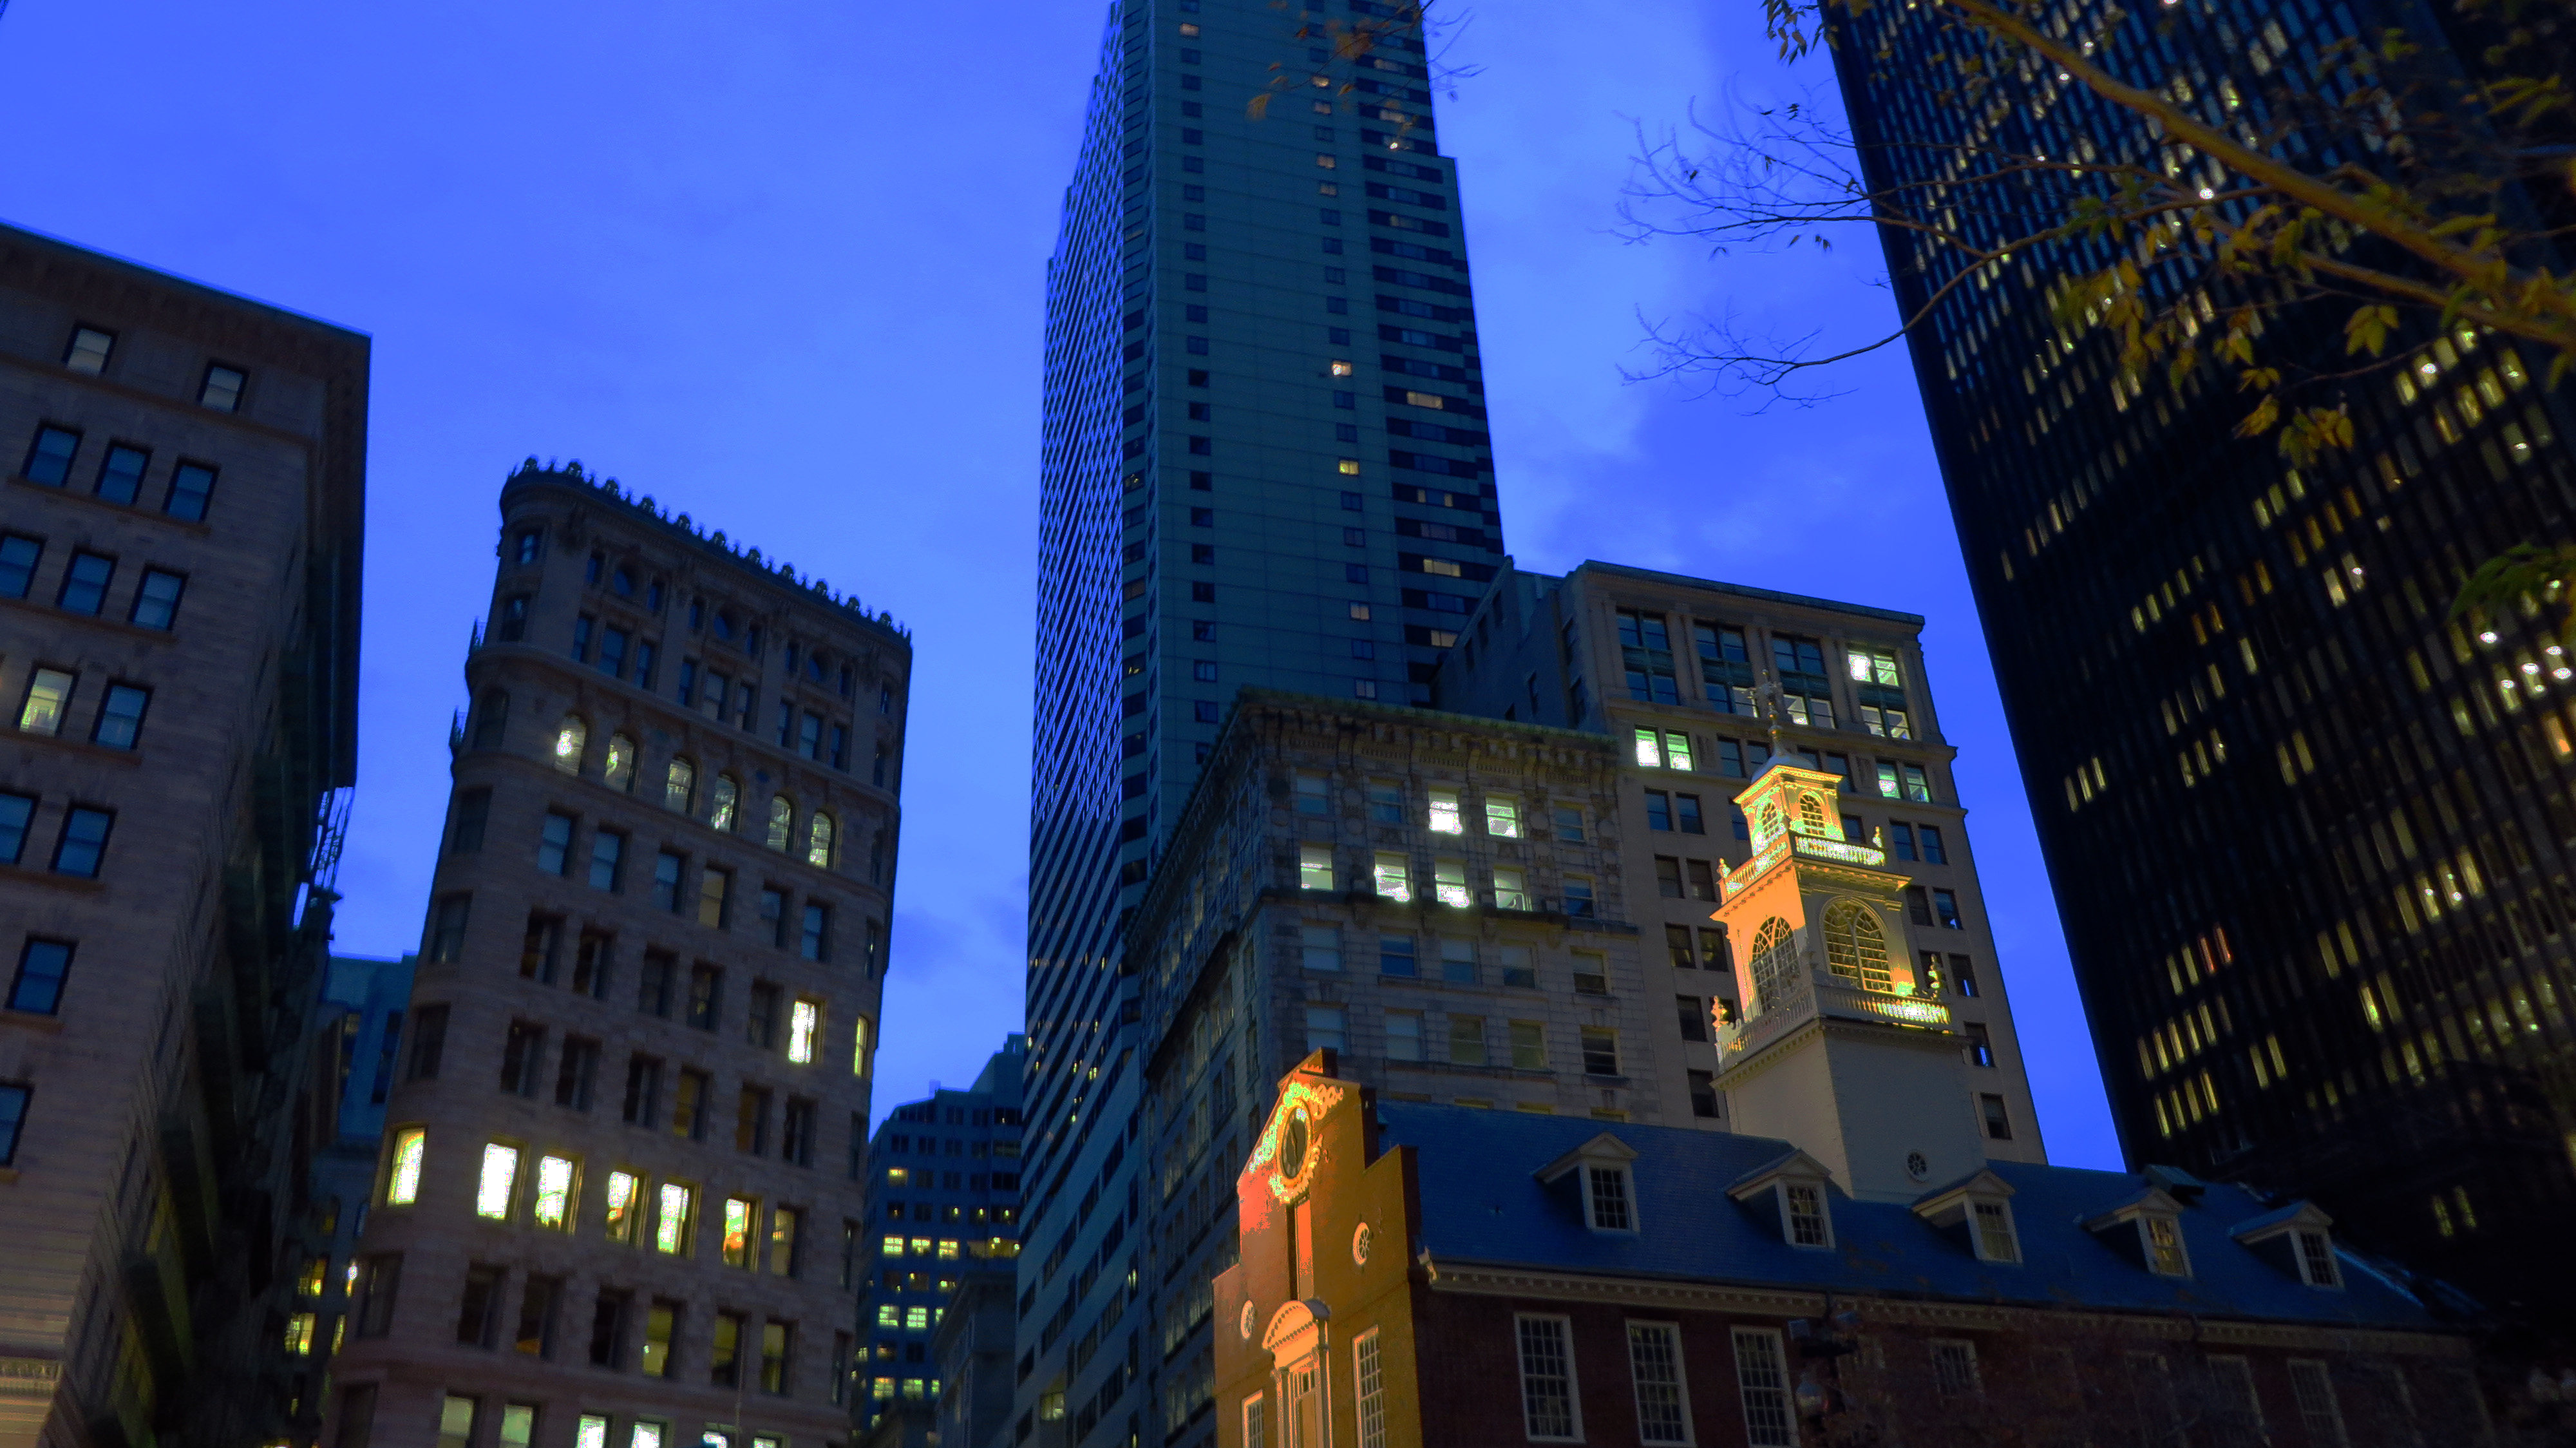 Night Scene in Boston, House, History, Massachusetts, Skyline, HQ Photo